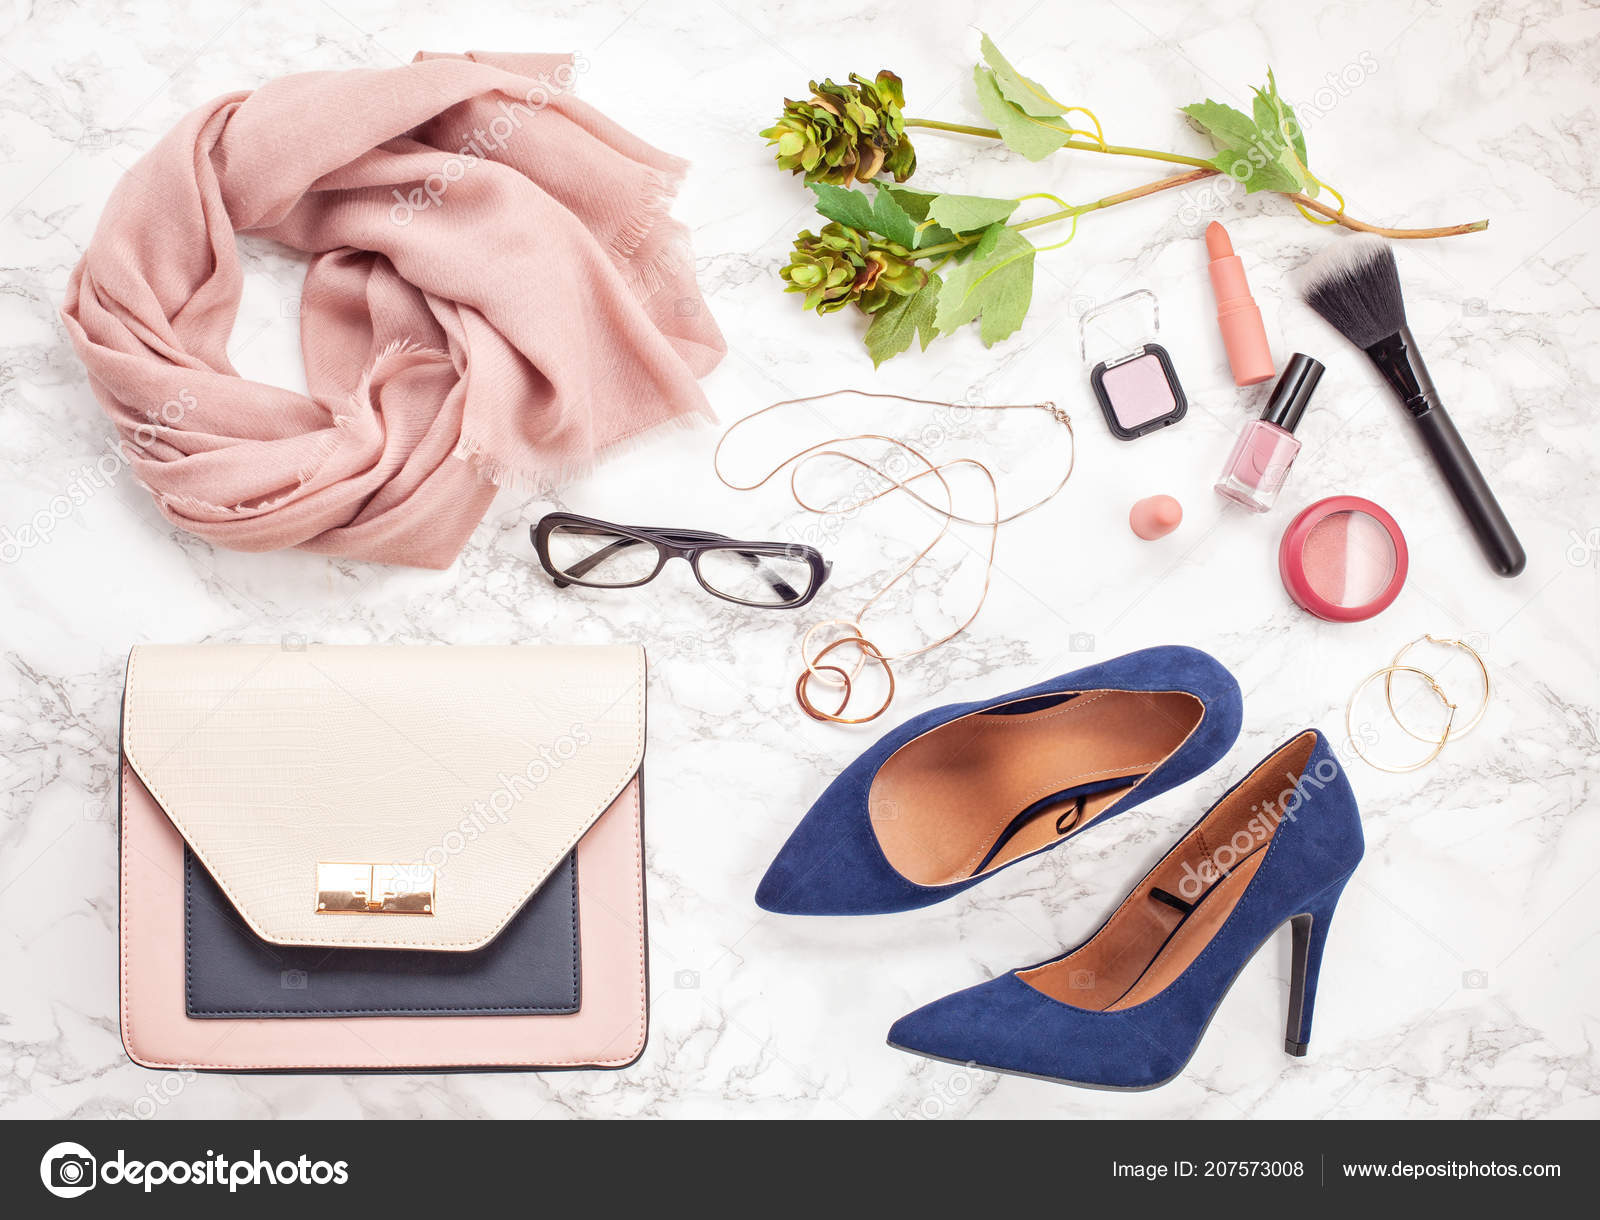 cbaddf4d6 Acessórios de moda e sapatos de salto alto azul para meninas e mulheres.  Tendências de moda urbana, conceito de blog de beleza — Foto de ...